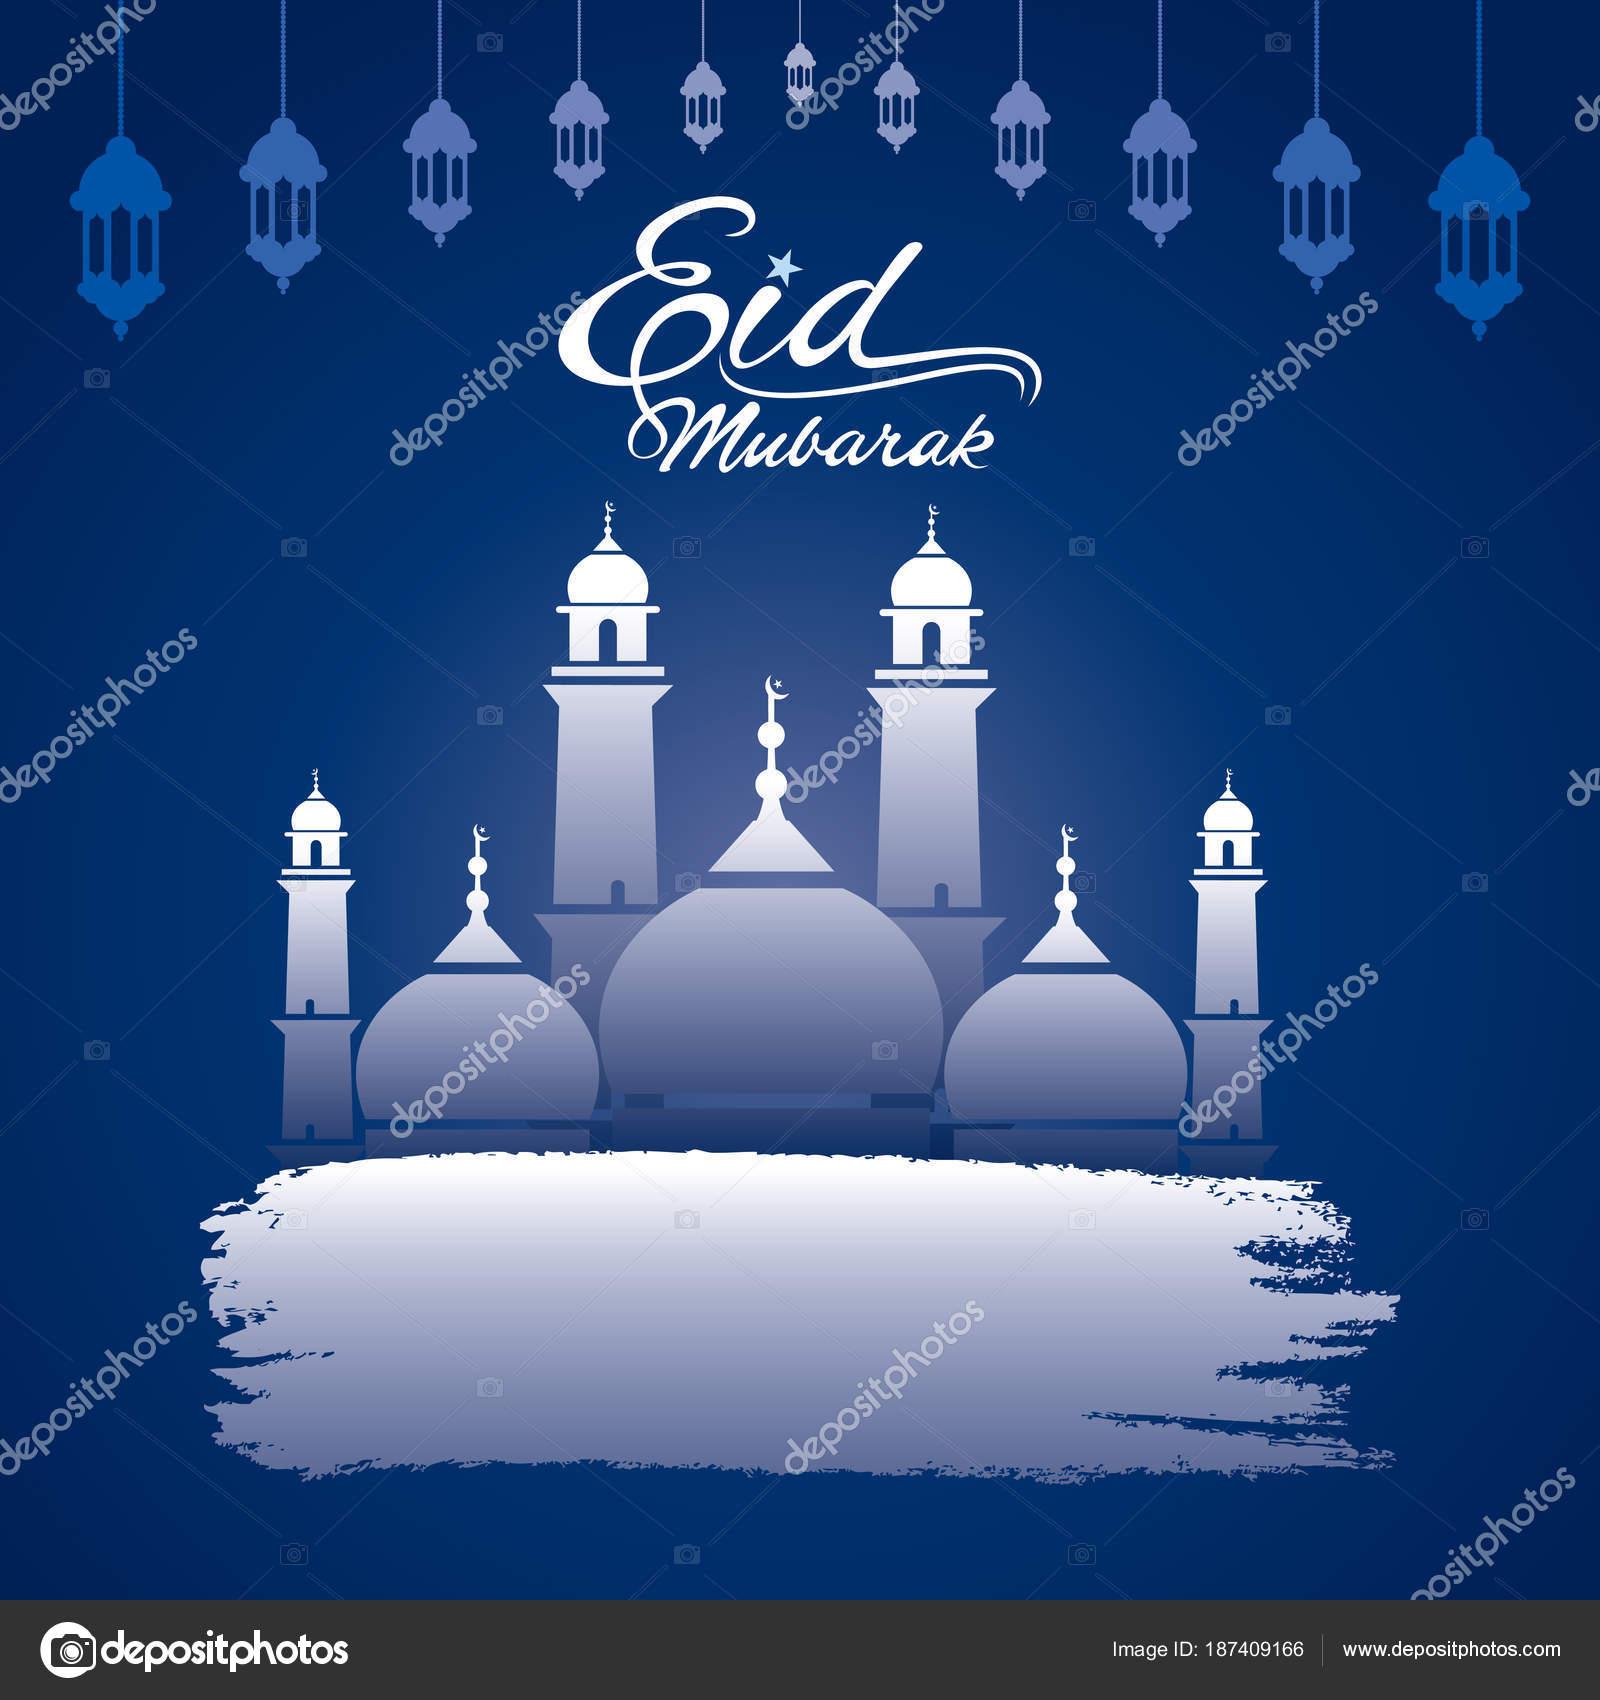 Happy eid mubarak greeting design stock vector vectotaart 187409166 creative eid mubarak festival greeting design vector by vectotaart kristyandbryce Choice Image